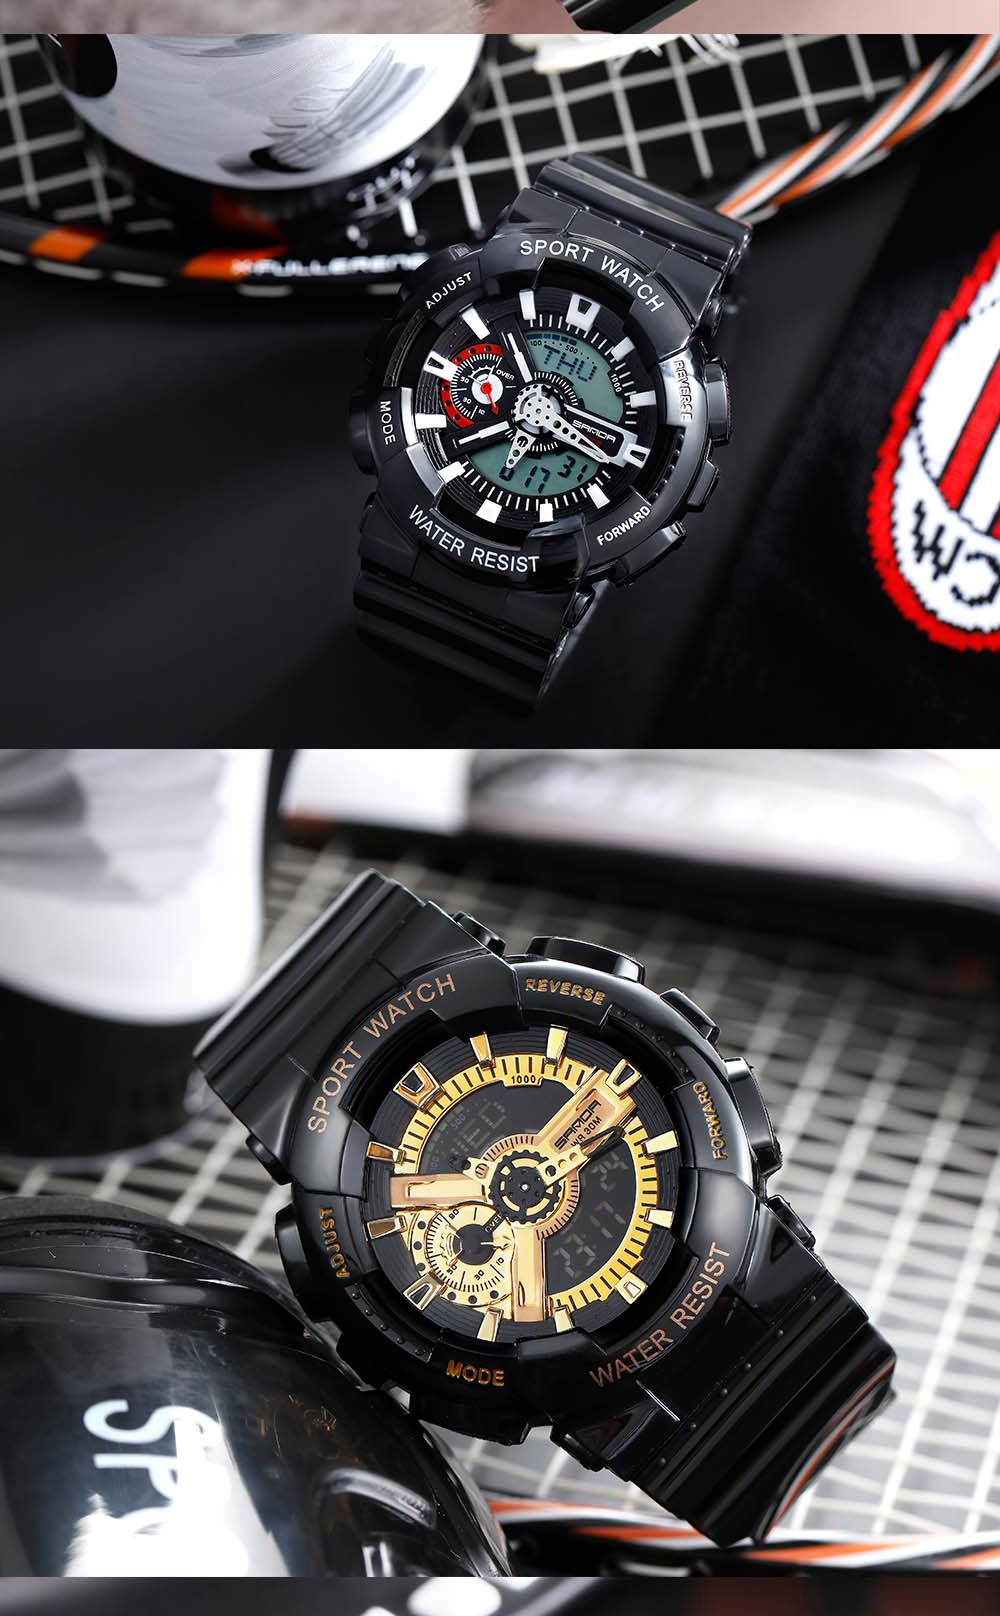 H566da4babf234b719a6136bff16f9108e 2020 SANDA Military Men's Watch Brand Luxury Waterproof Sport Wristwatch Fashion Quartz Clock Couple Watch relogio masculino